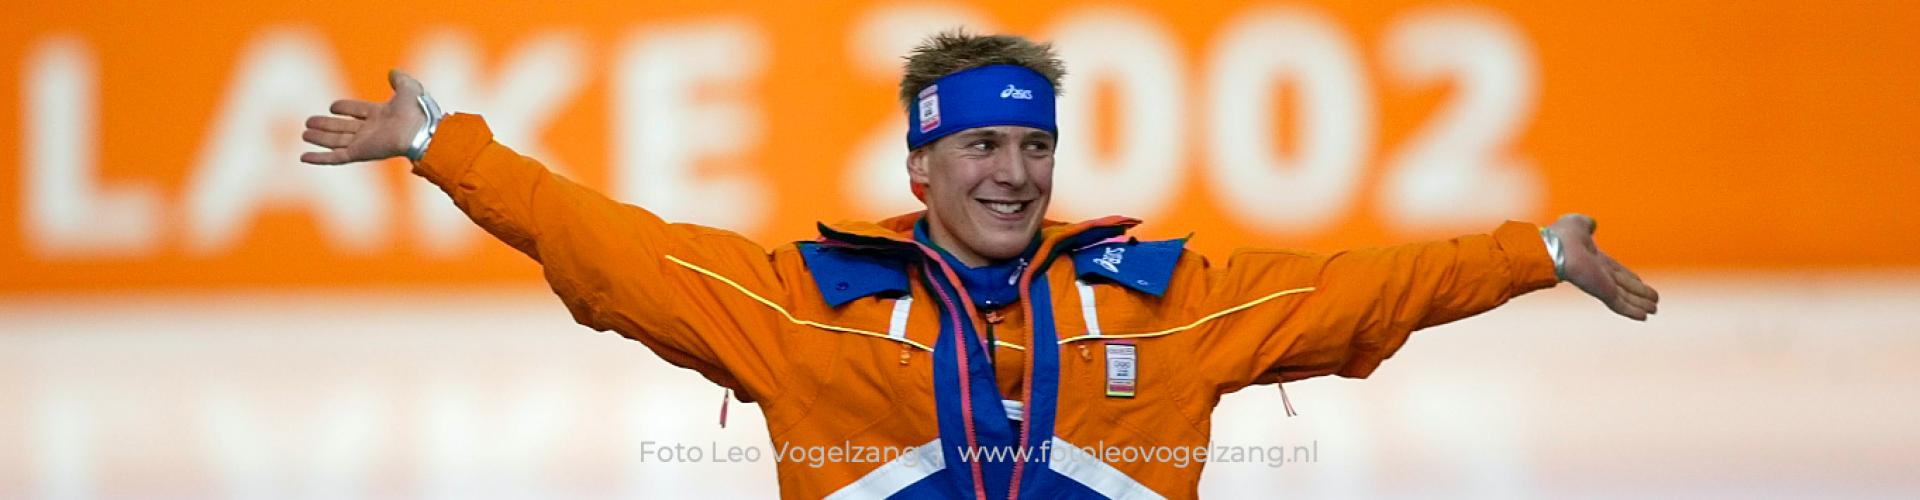 Jochem Uytdehaage Spreker trainer inspirator energie vitaliteit keynote